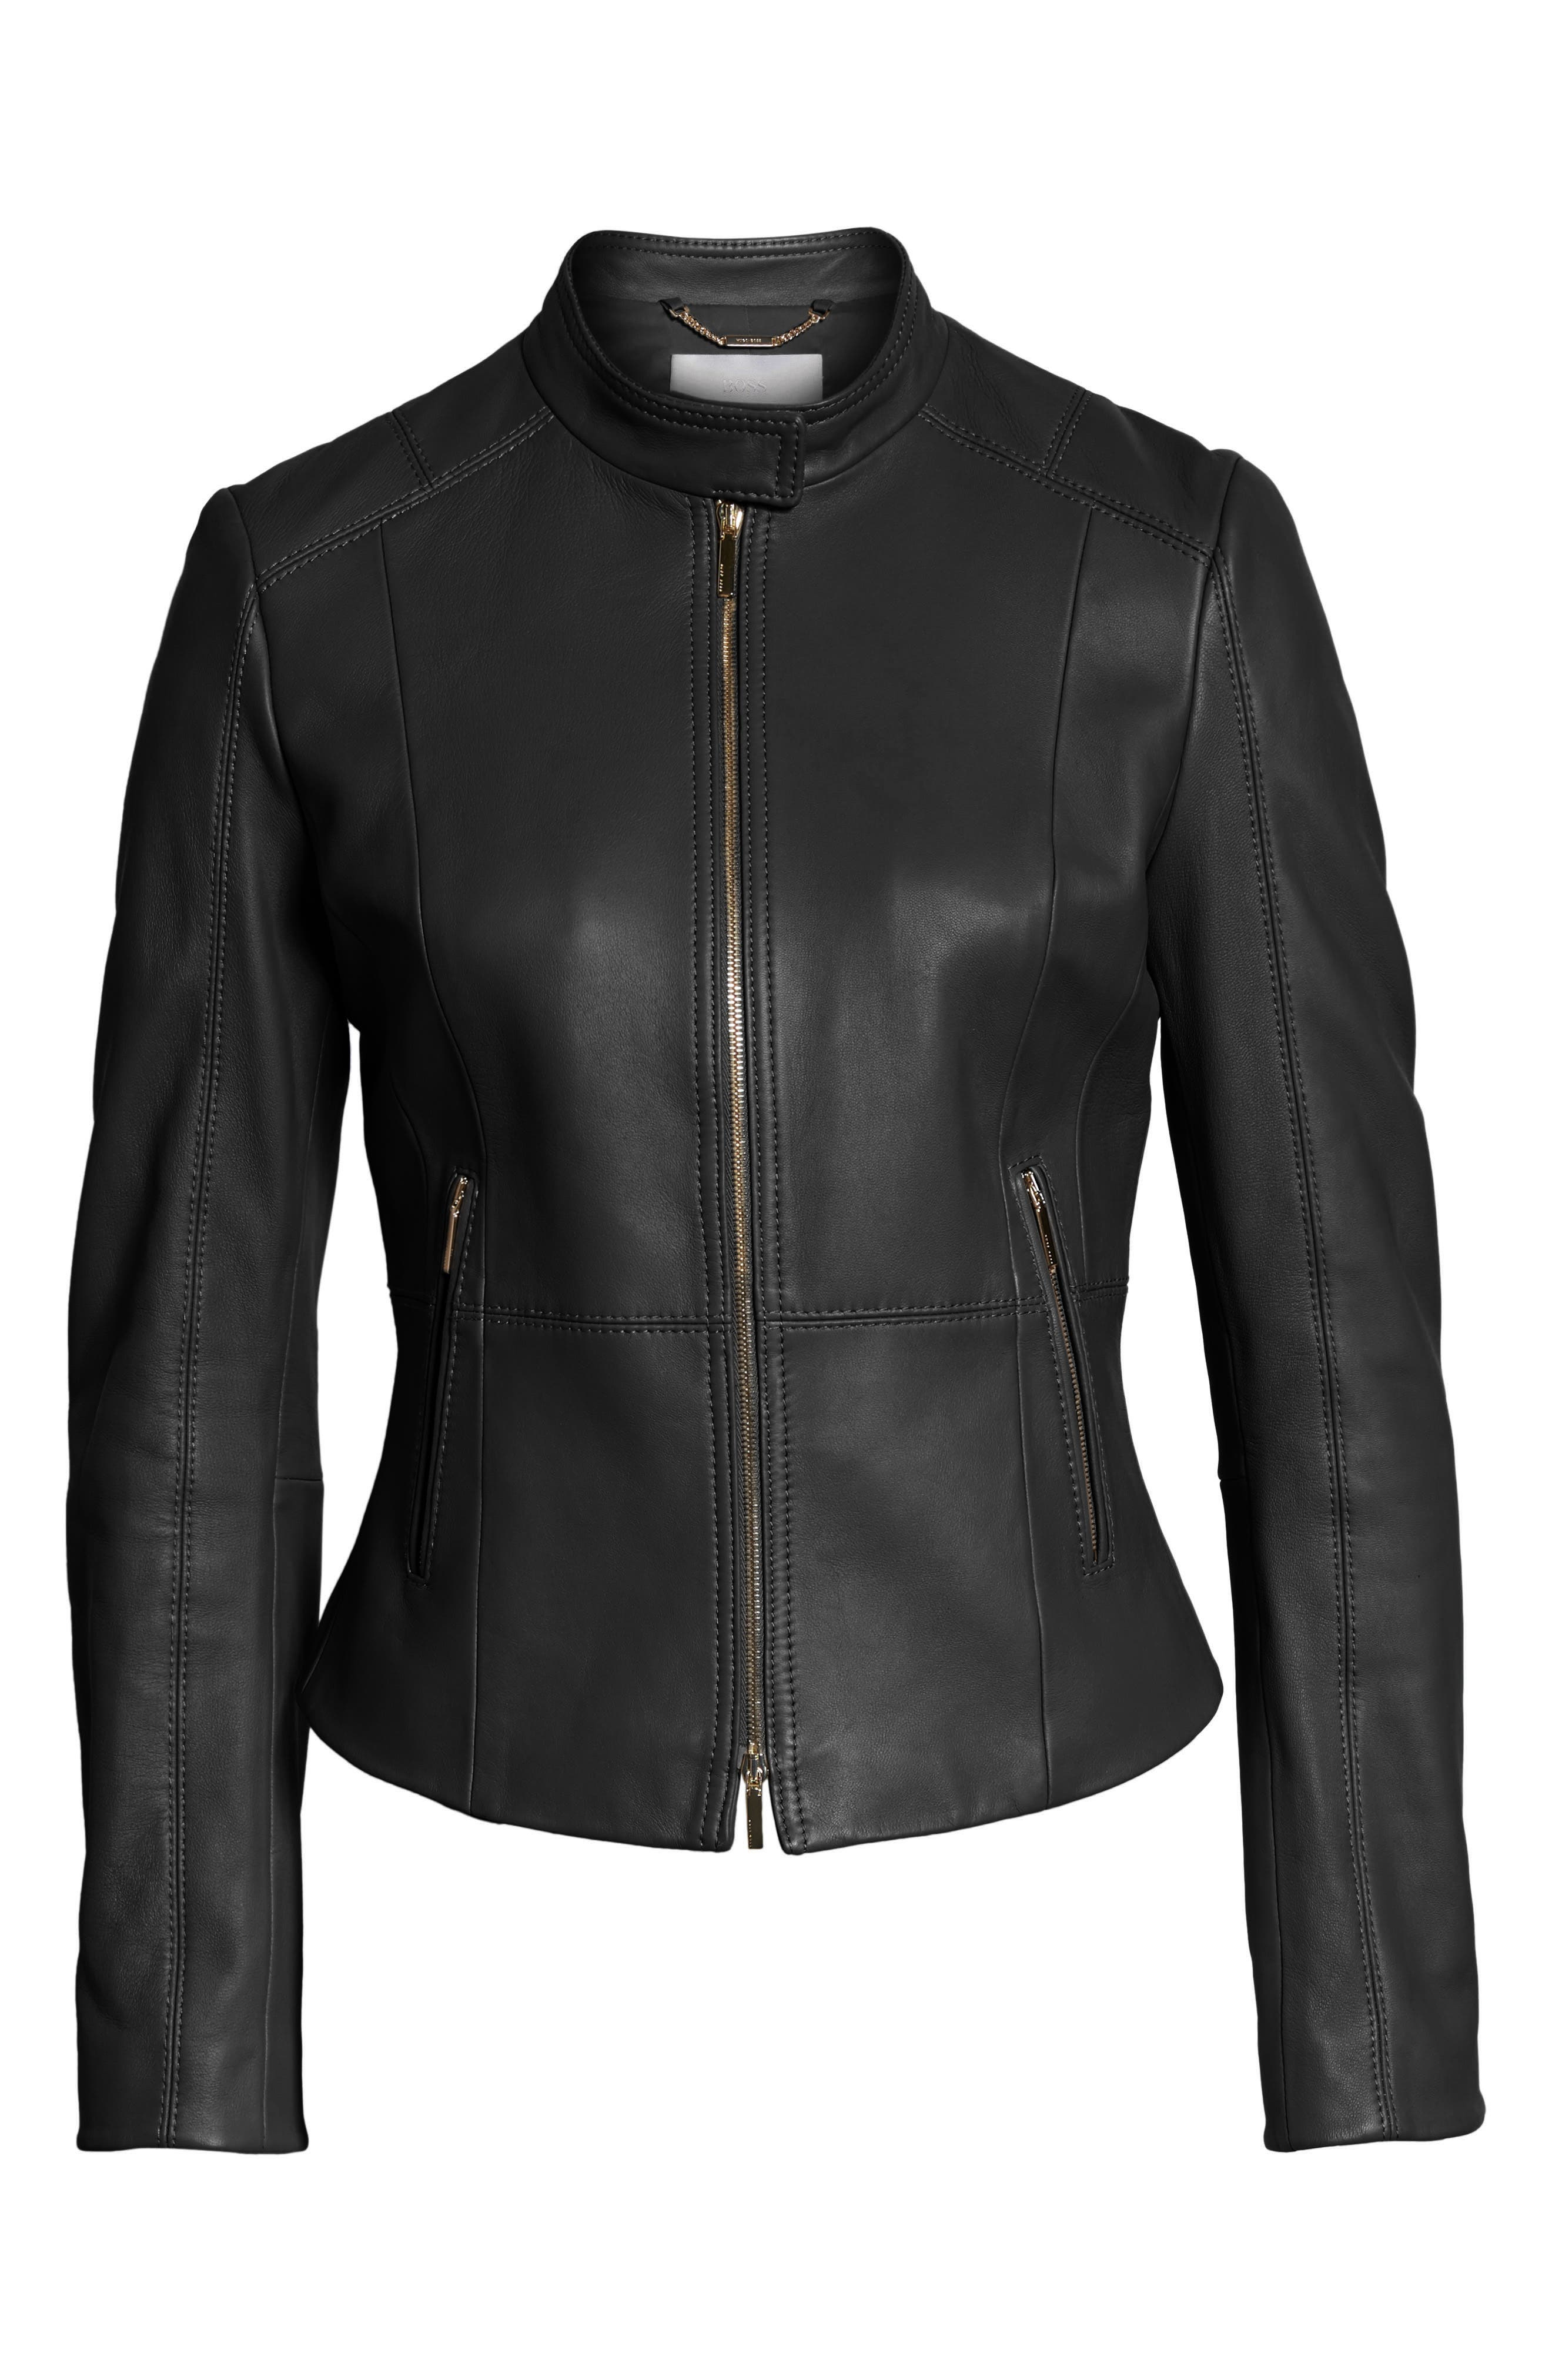 Sammonaie Leather Jacket,                             Alternate thumbnail 3, color,